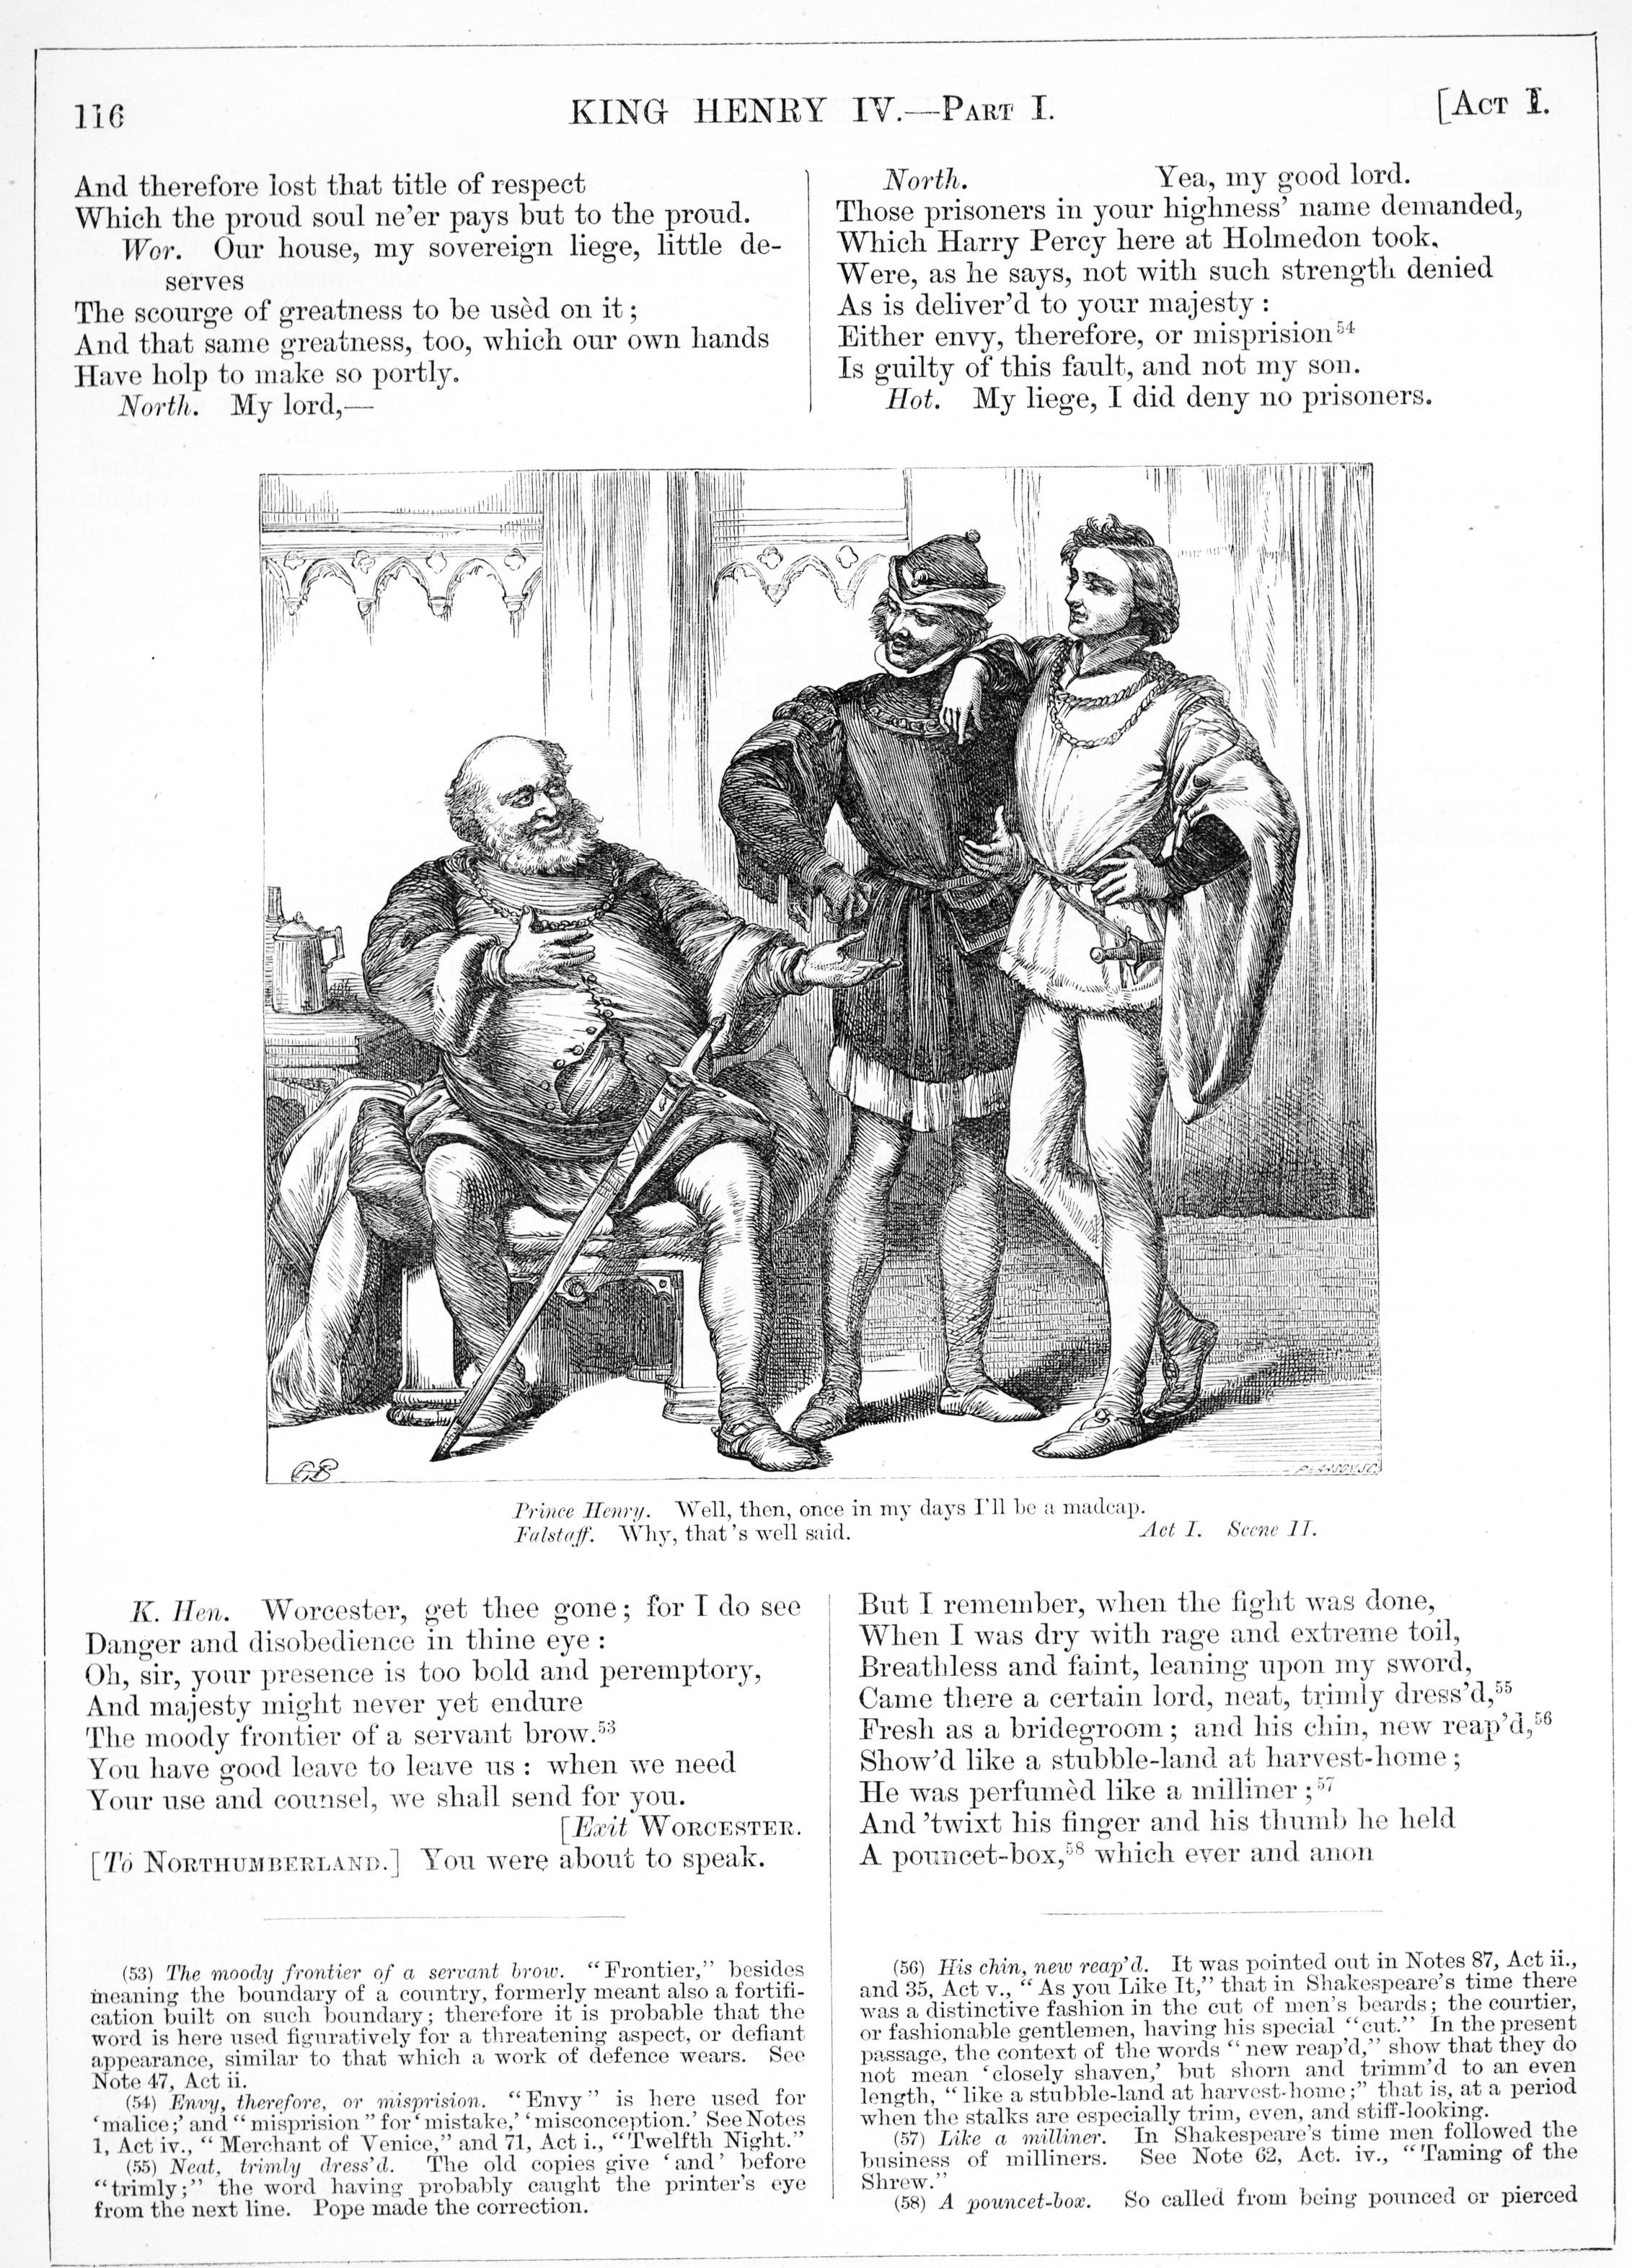 H. C. Selous, King Henry IV Part I, Illustration #3